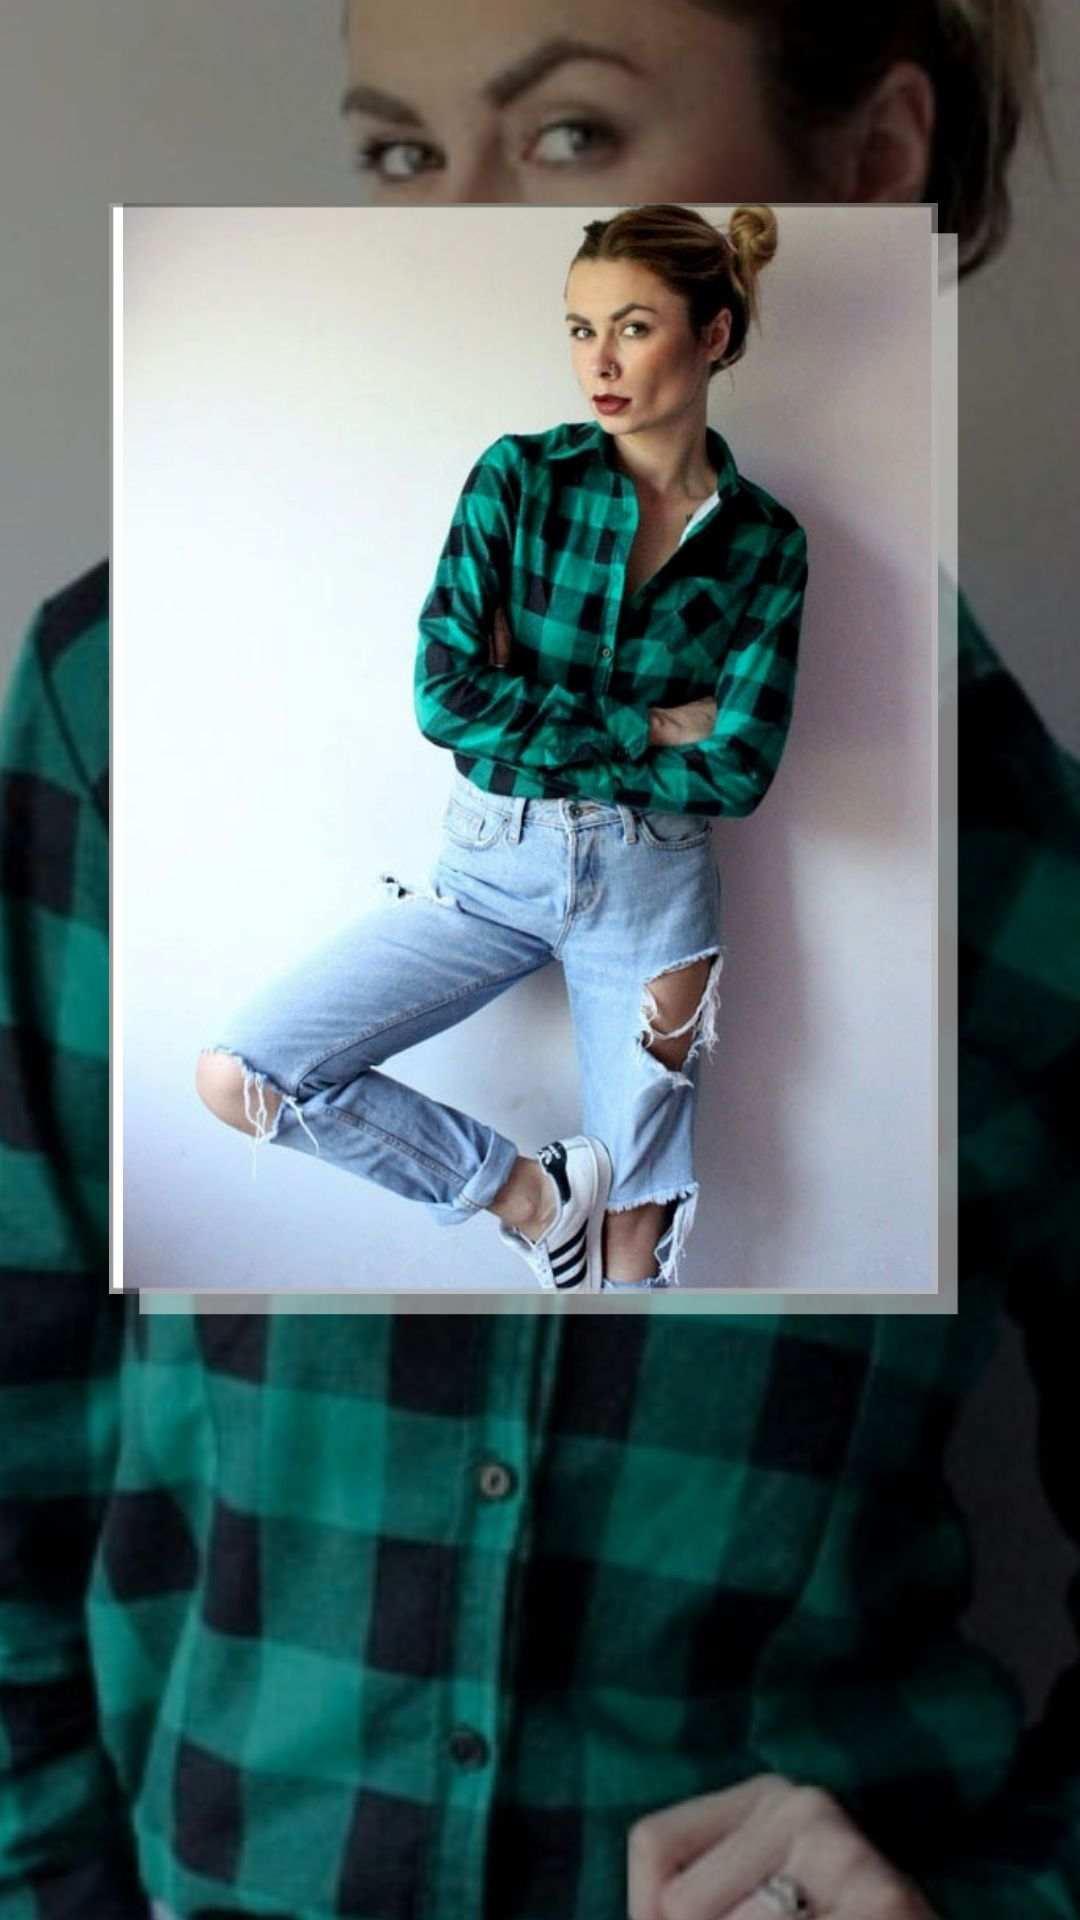 Koszula W Krate Zielona Flanela M Polski Producent 8477440661 Oficjalne Archiwum Allegro Long Sleeve Blouse Fashion Women S Top